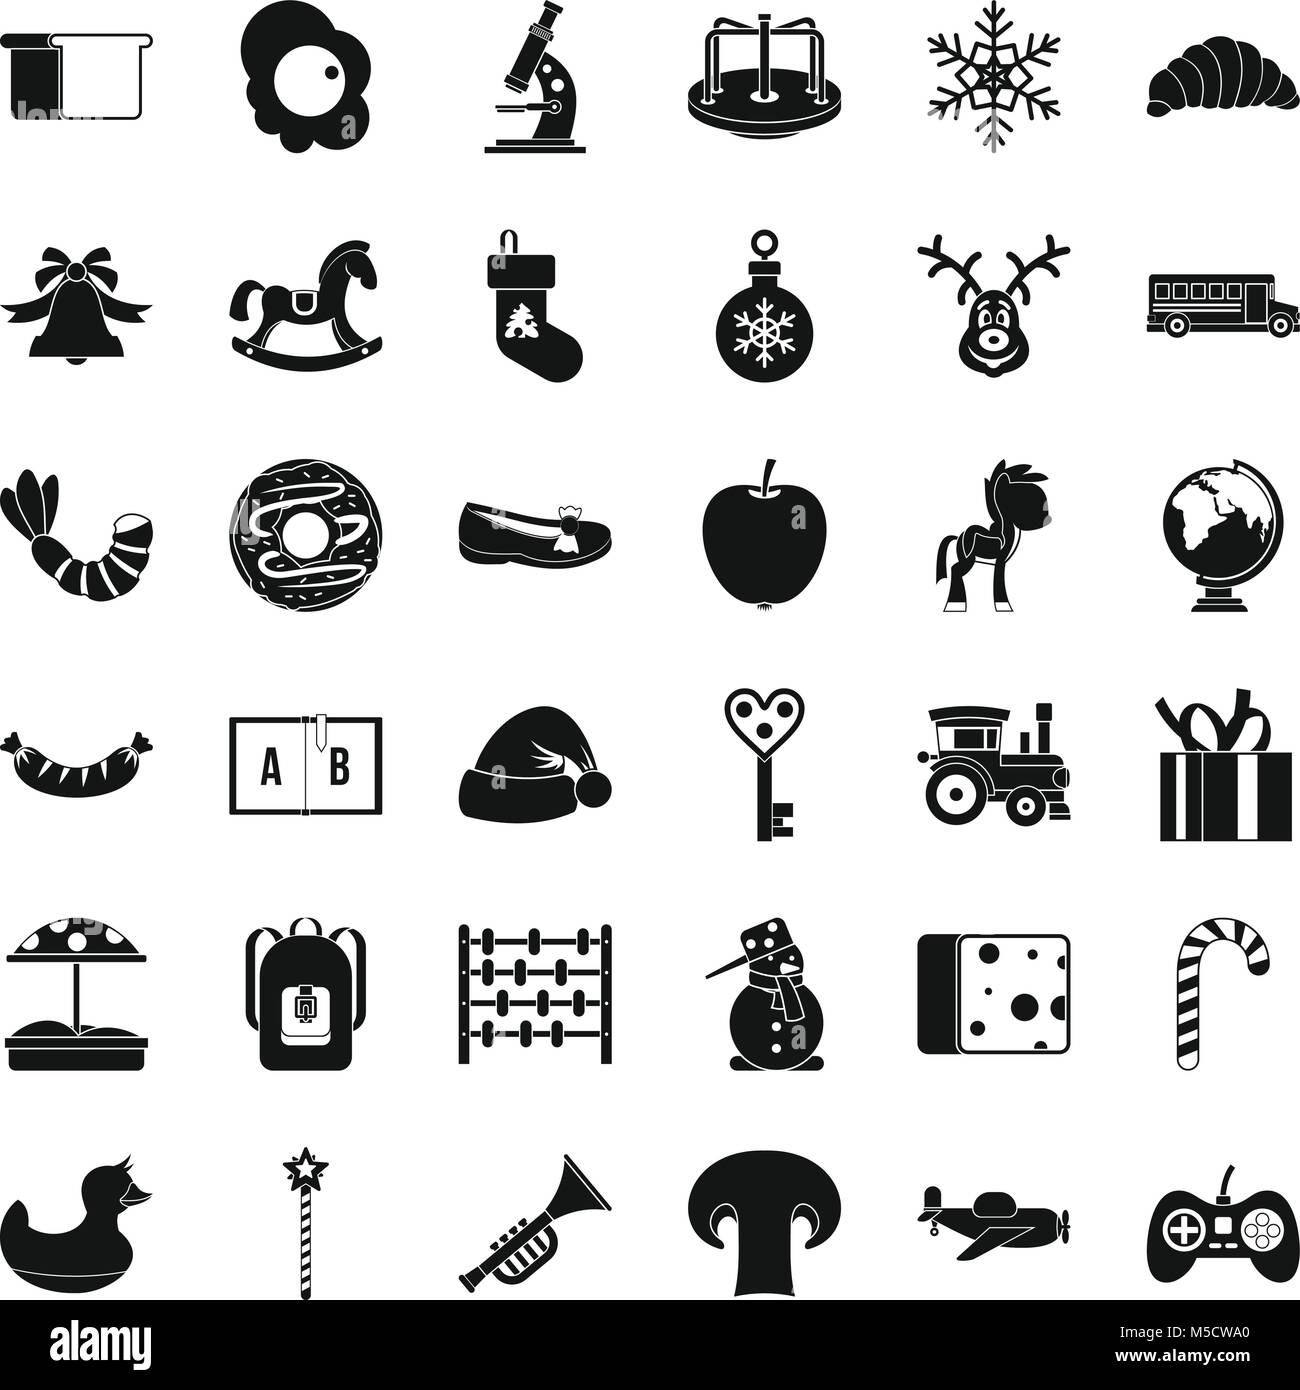 Preparatory class icons set, simple style - Stock Image